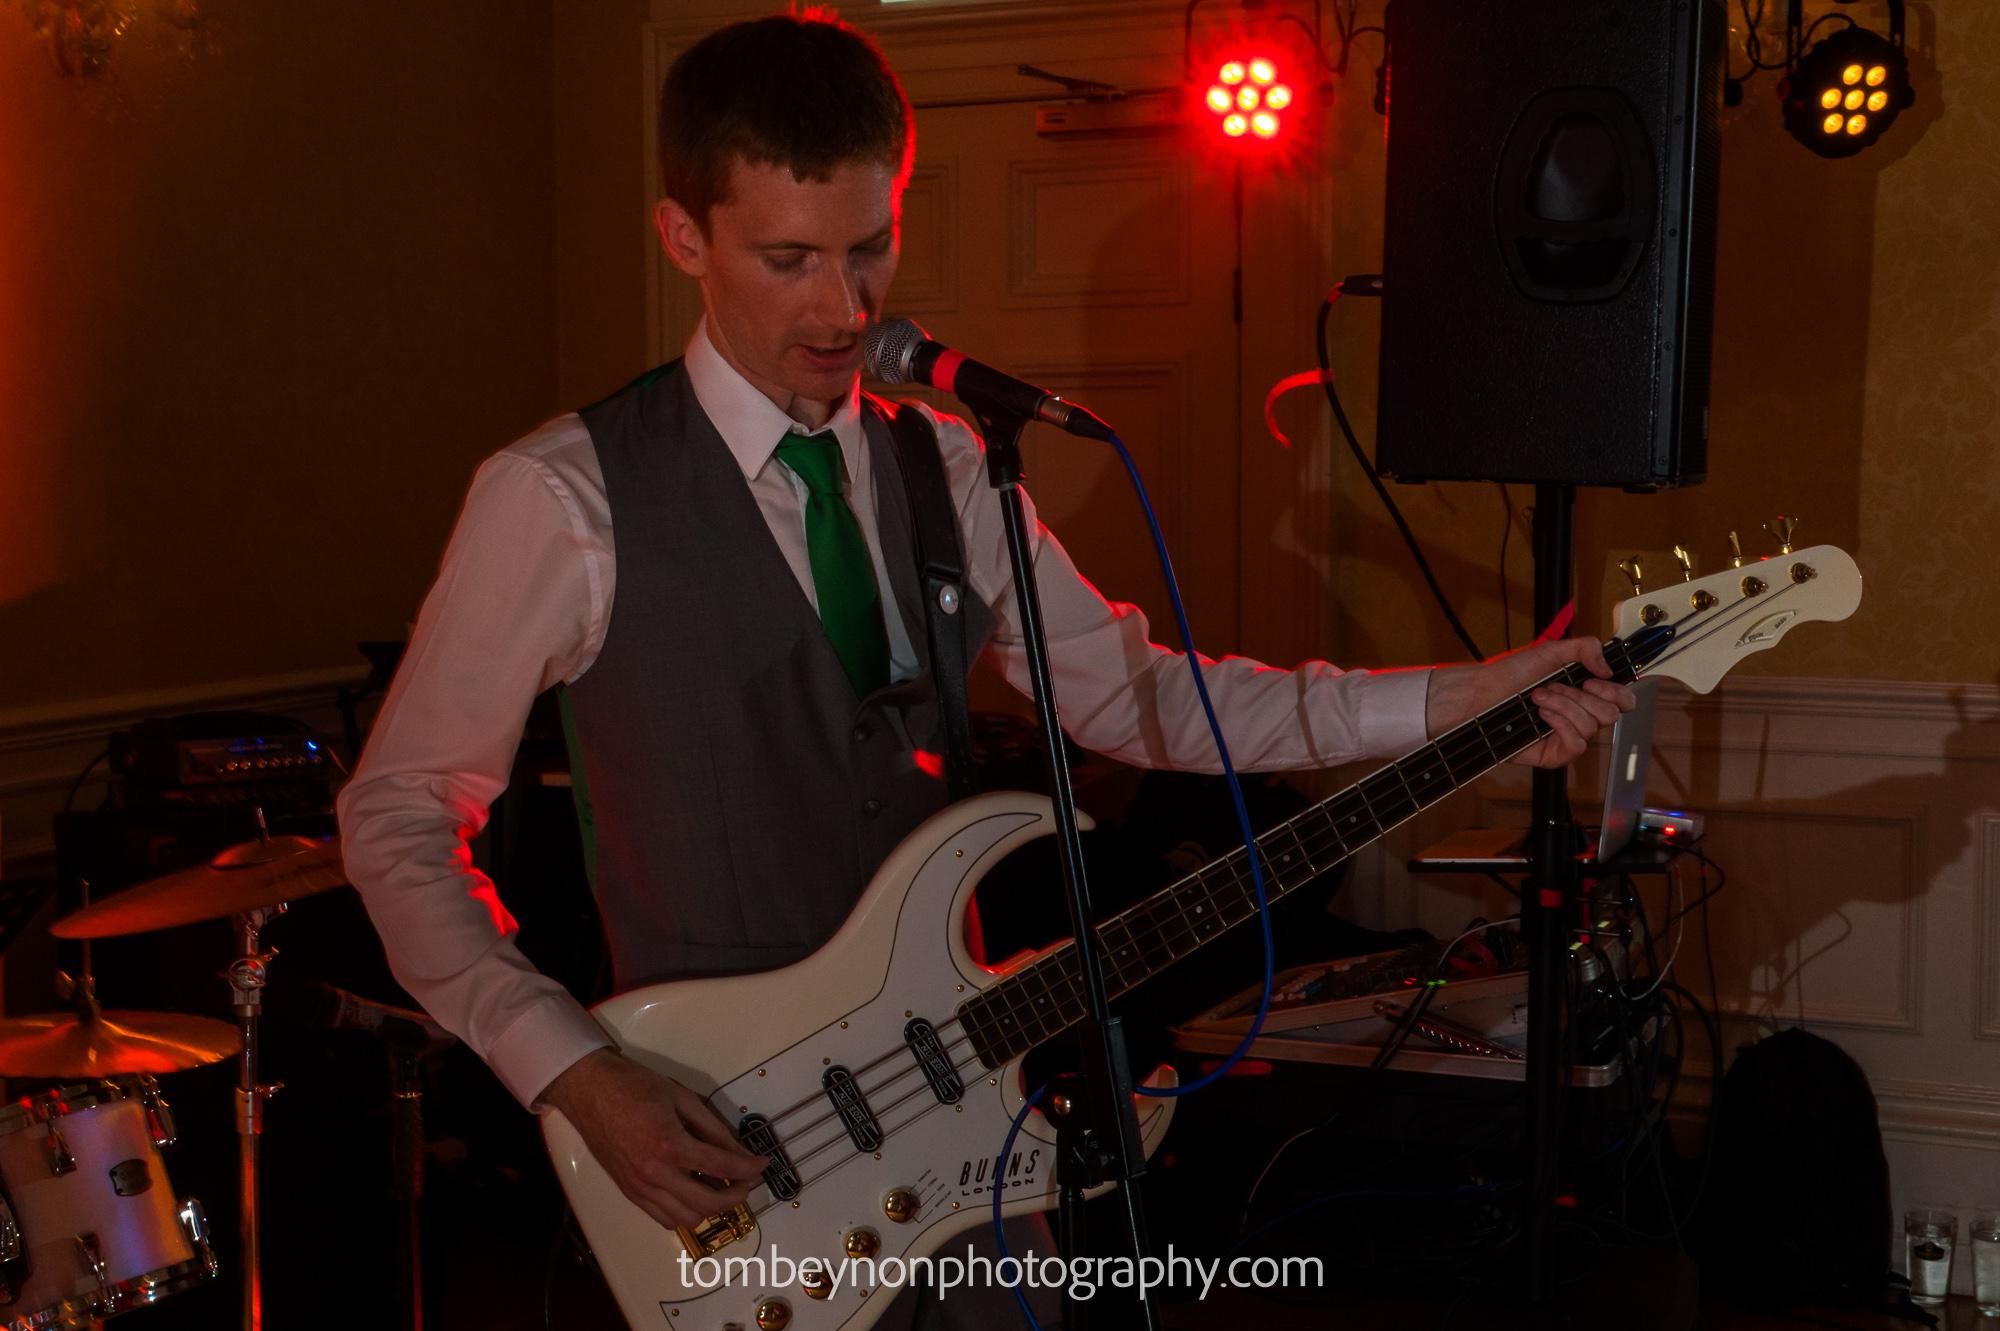 Groom plays bass